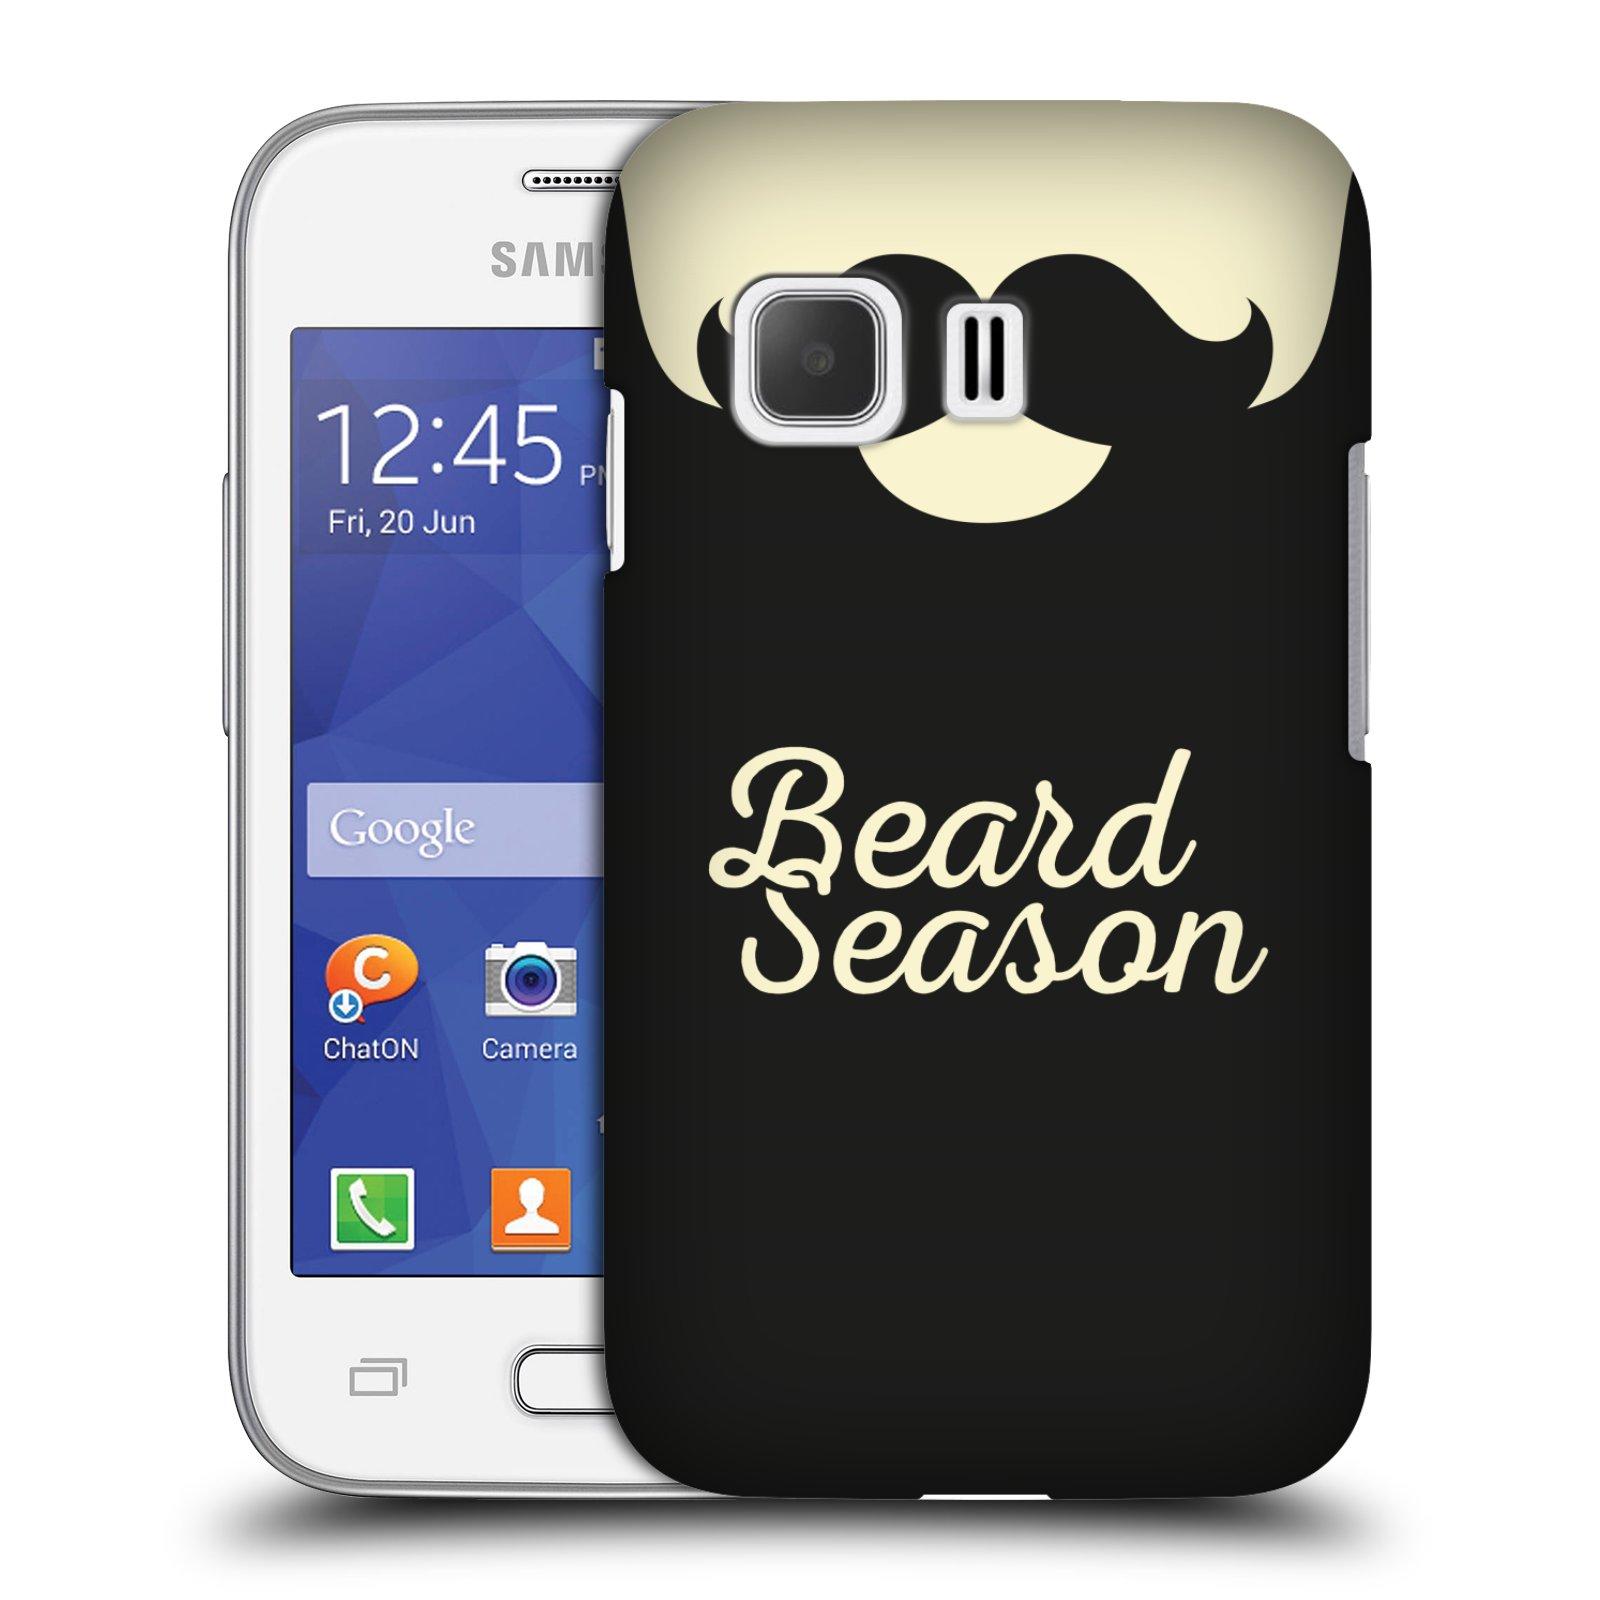 Plastové pouzdro na mobil Samsung Galaxy Young 2 HEAD CASE KNÍR BEARD SEASON (Plastový kryt či obal na mobilní telefon Samsung Galaxy Young 2 SM-G130)